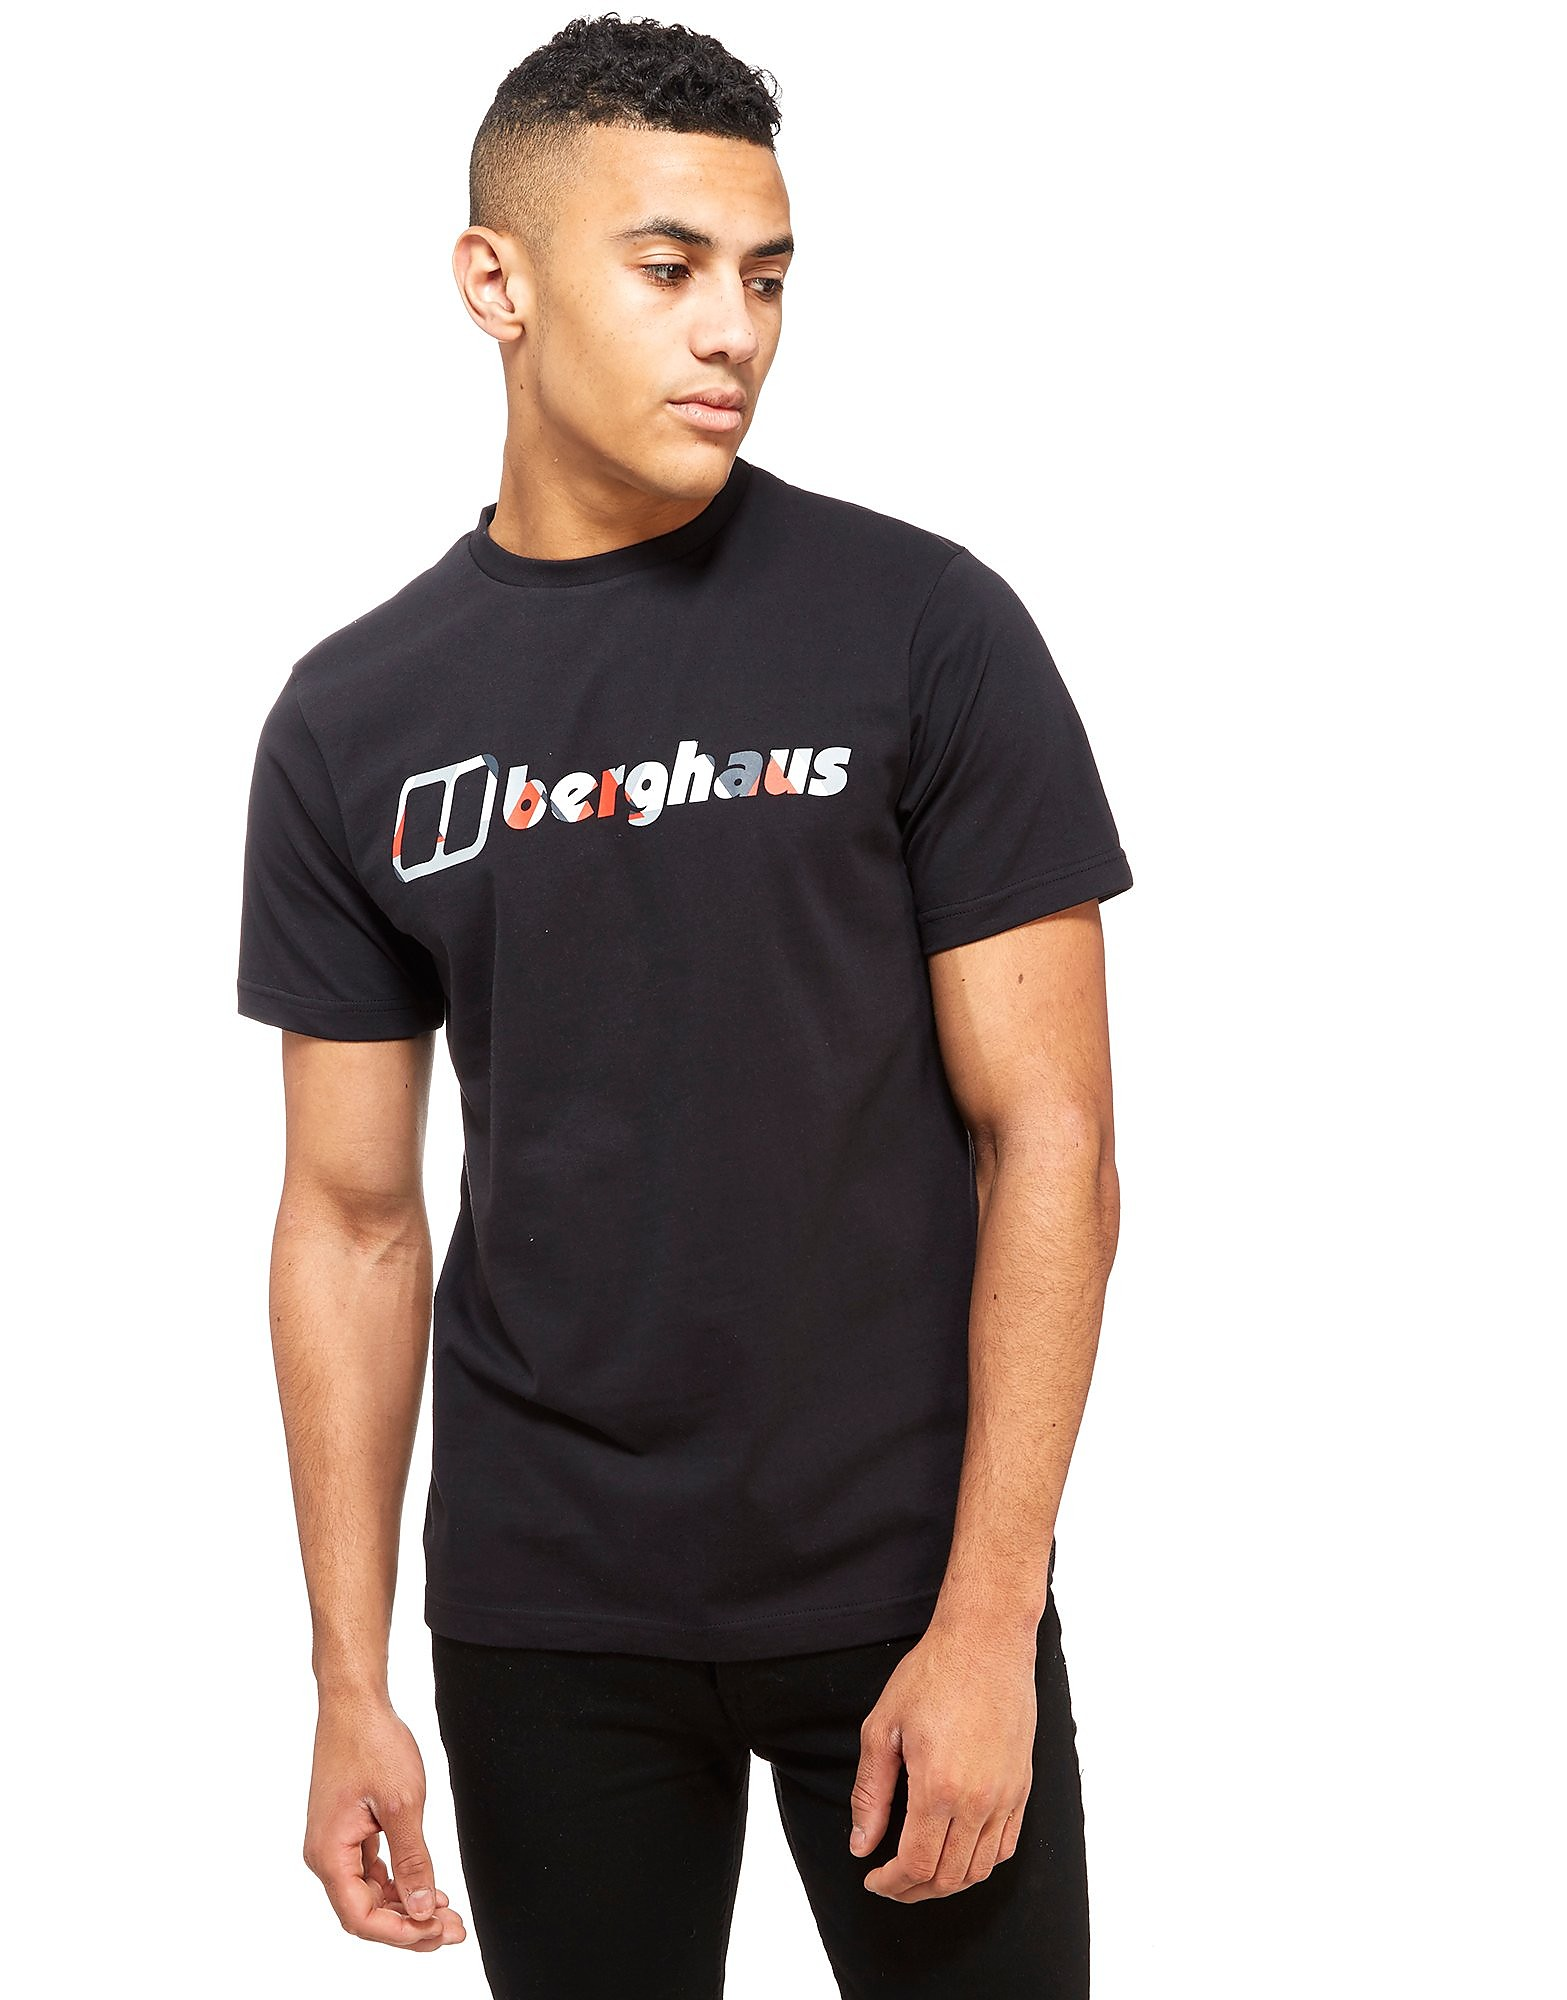 Berghaus Block 9 T-Shirt